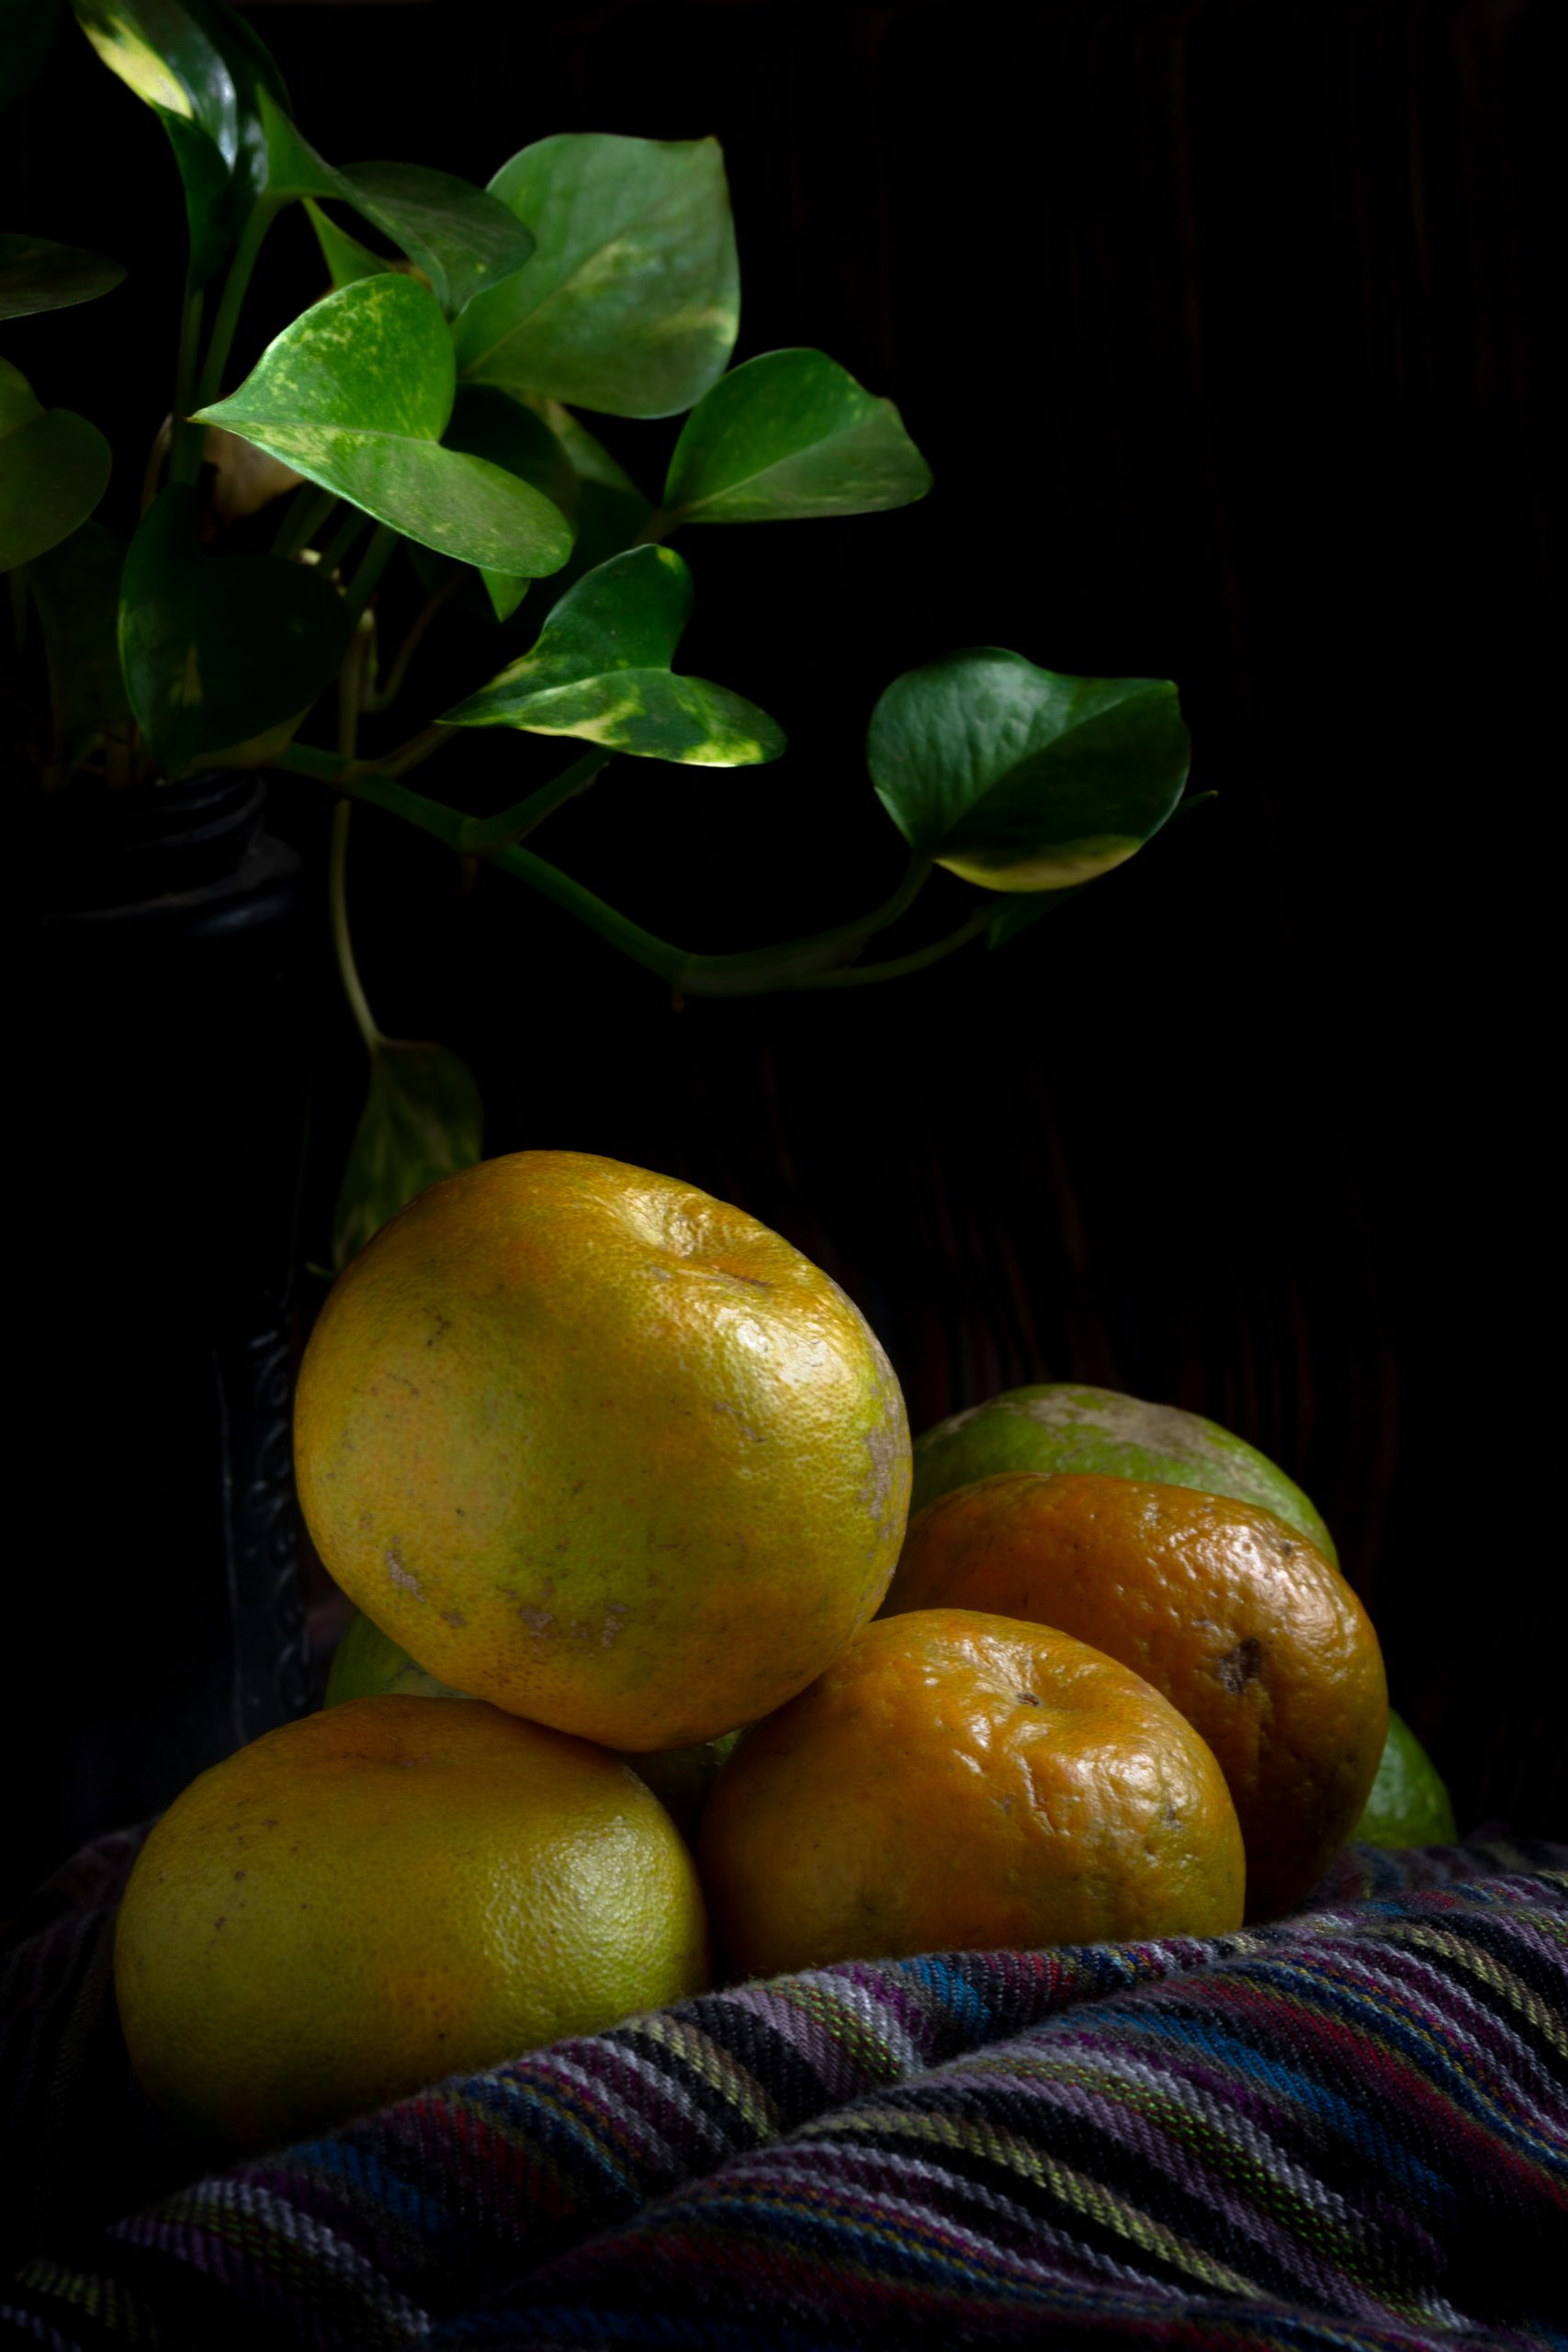 oranges for health